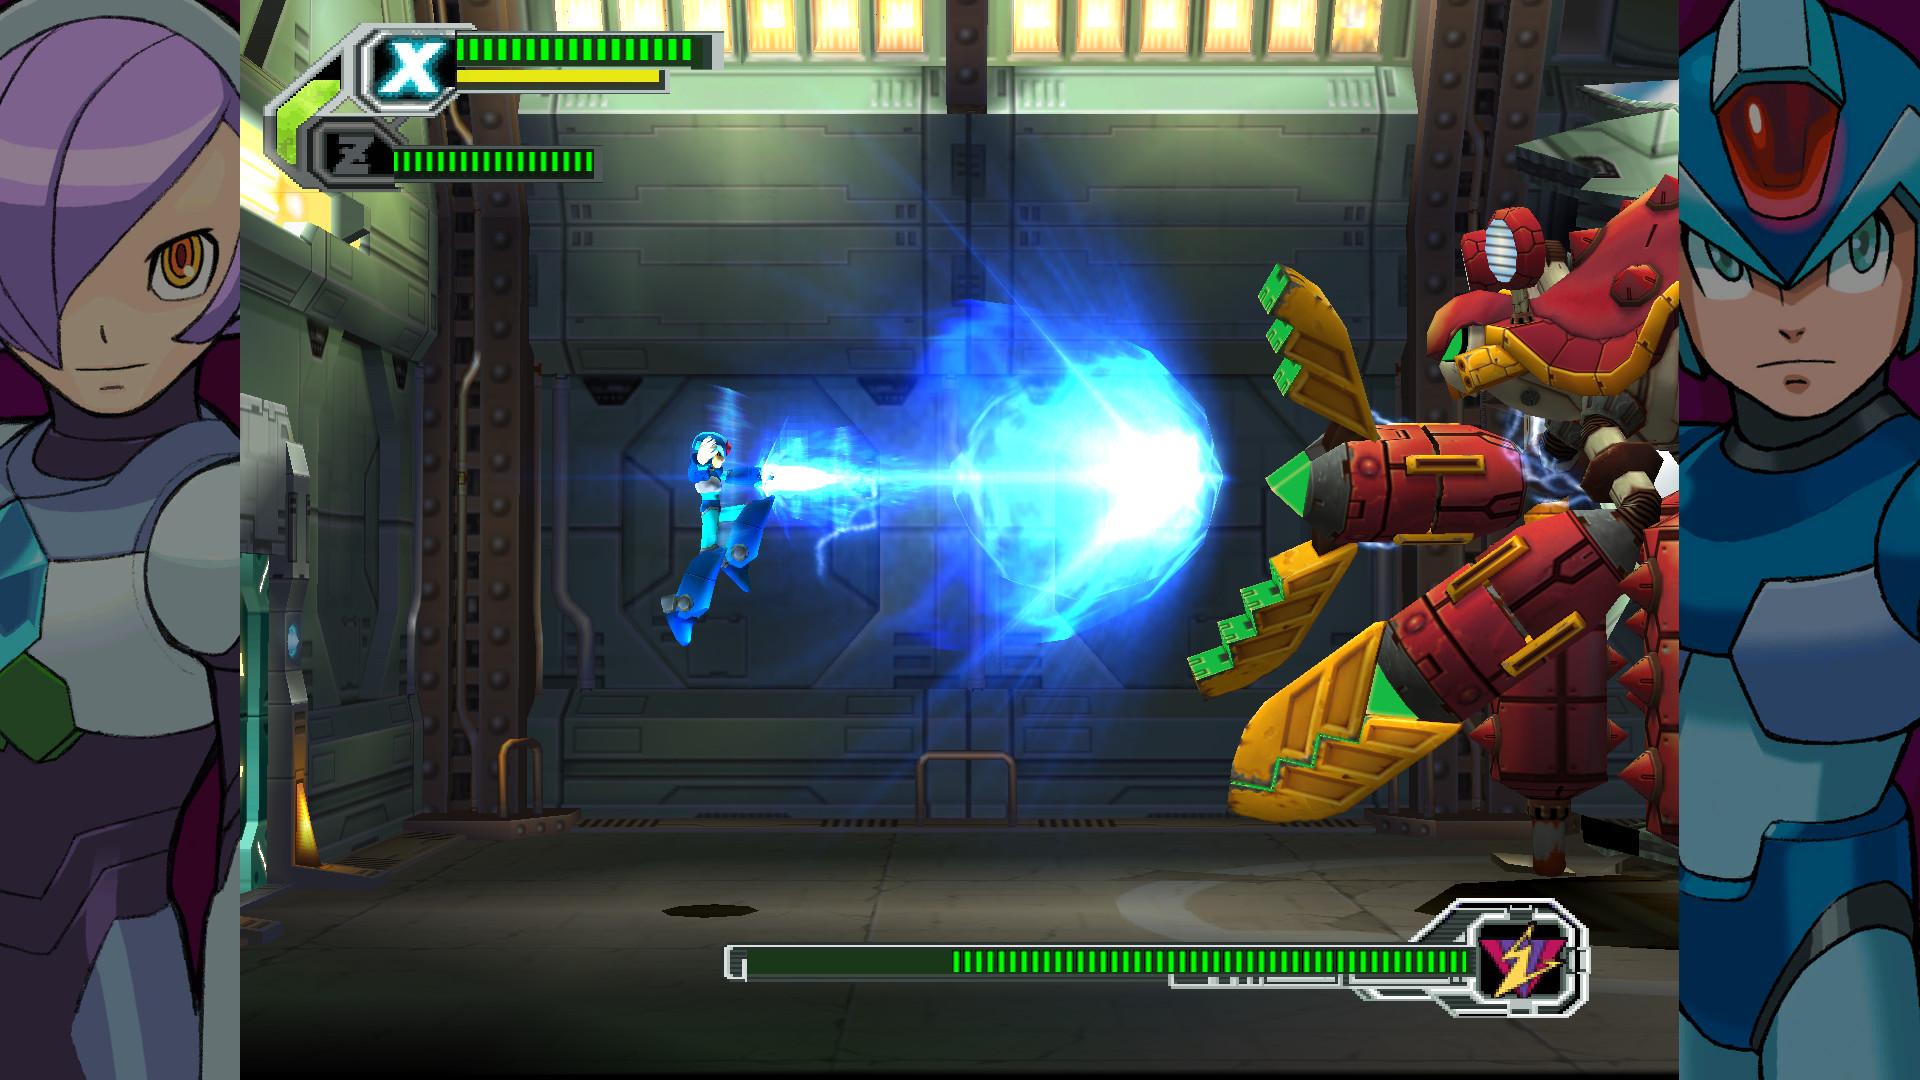 Mega Man X Legacy Collection 2 / ロックマンX アニバーサリー コレクション 2